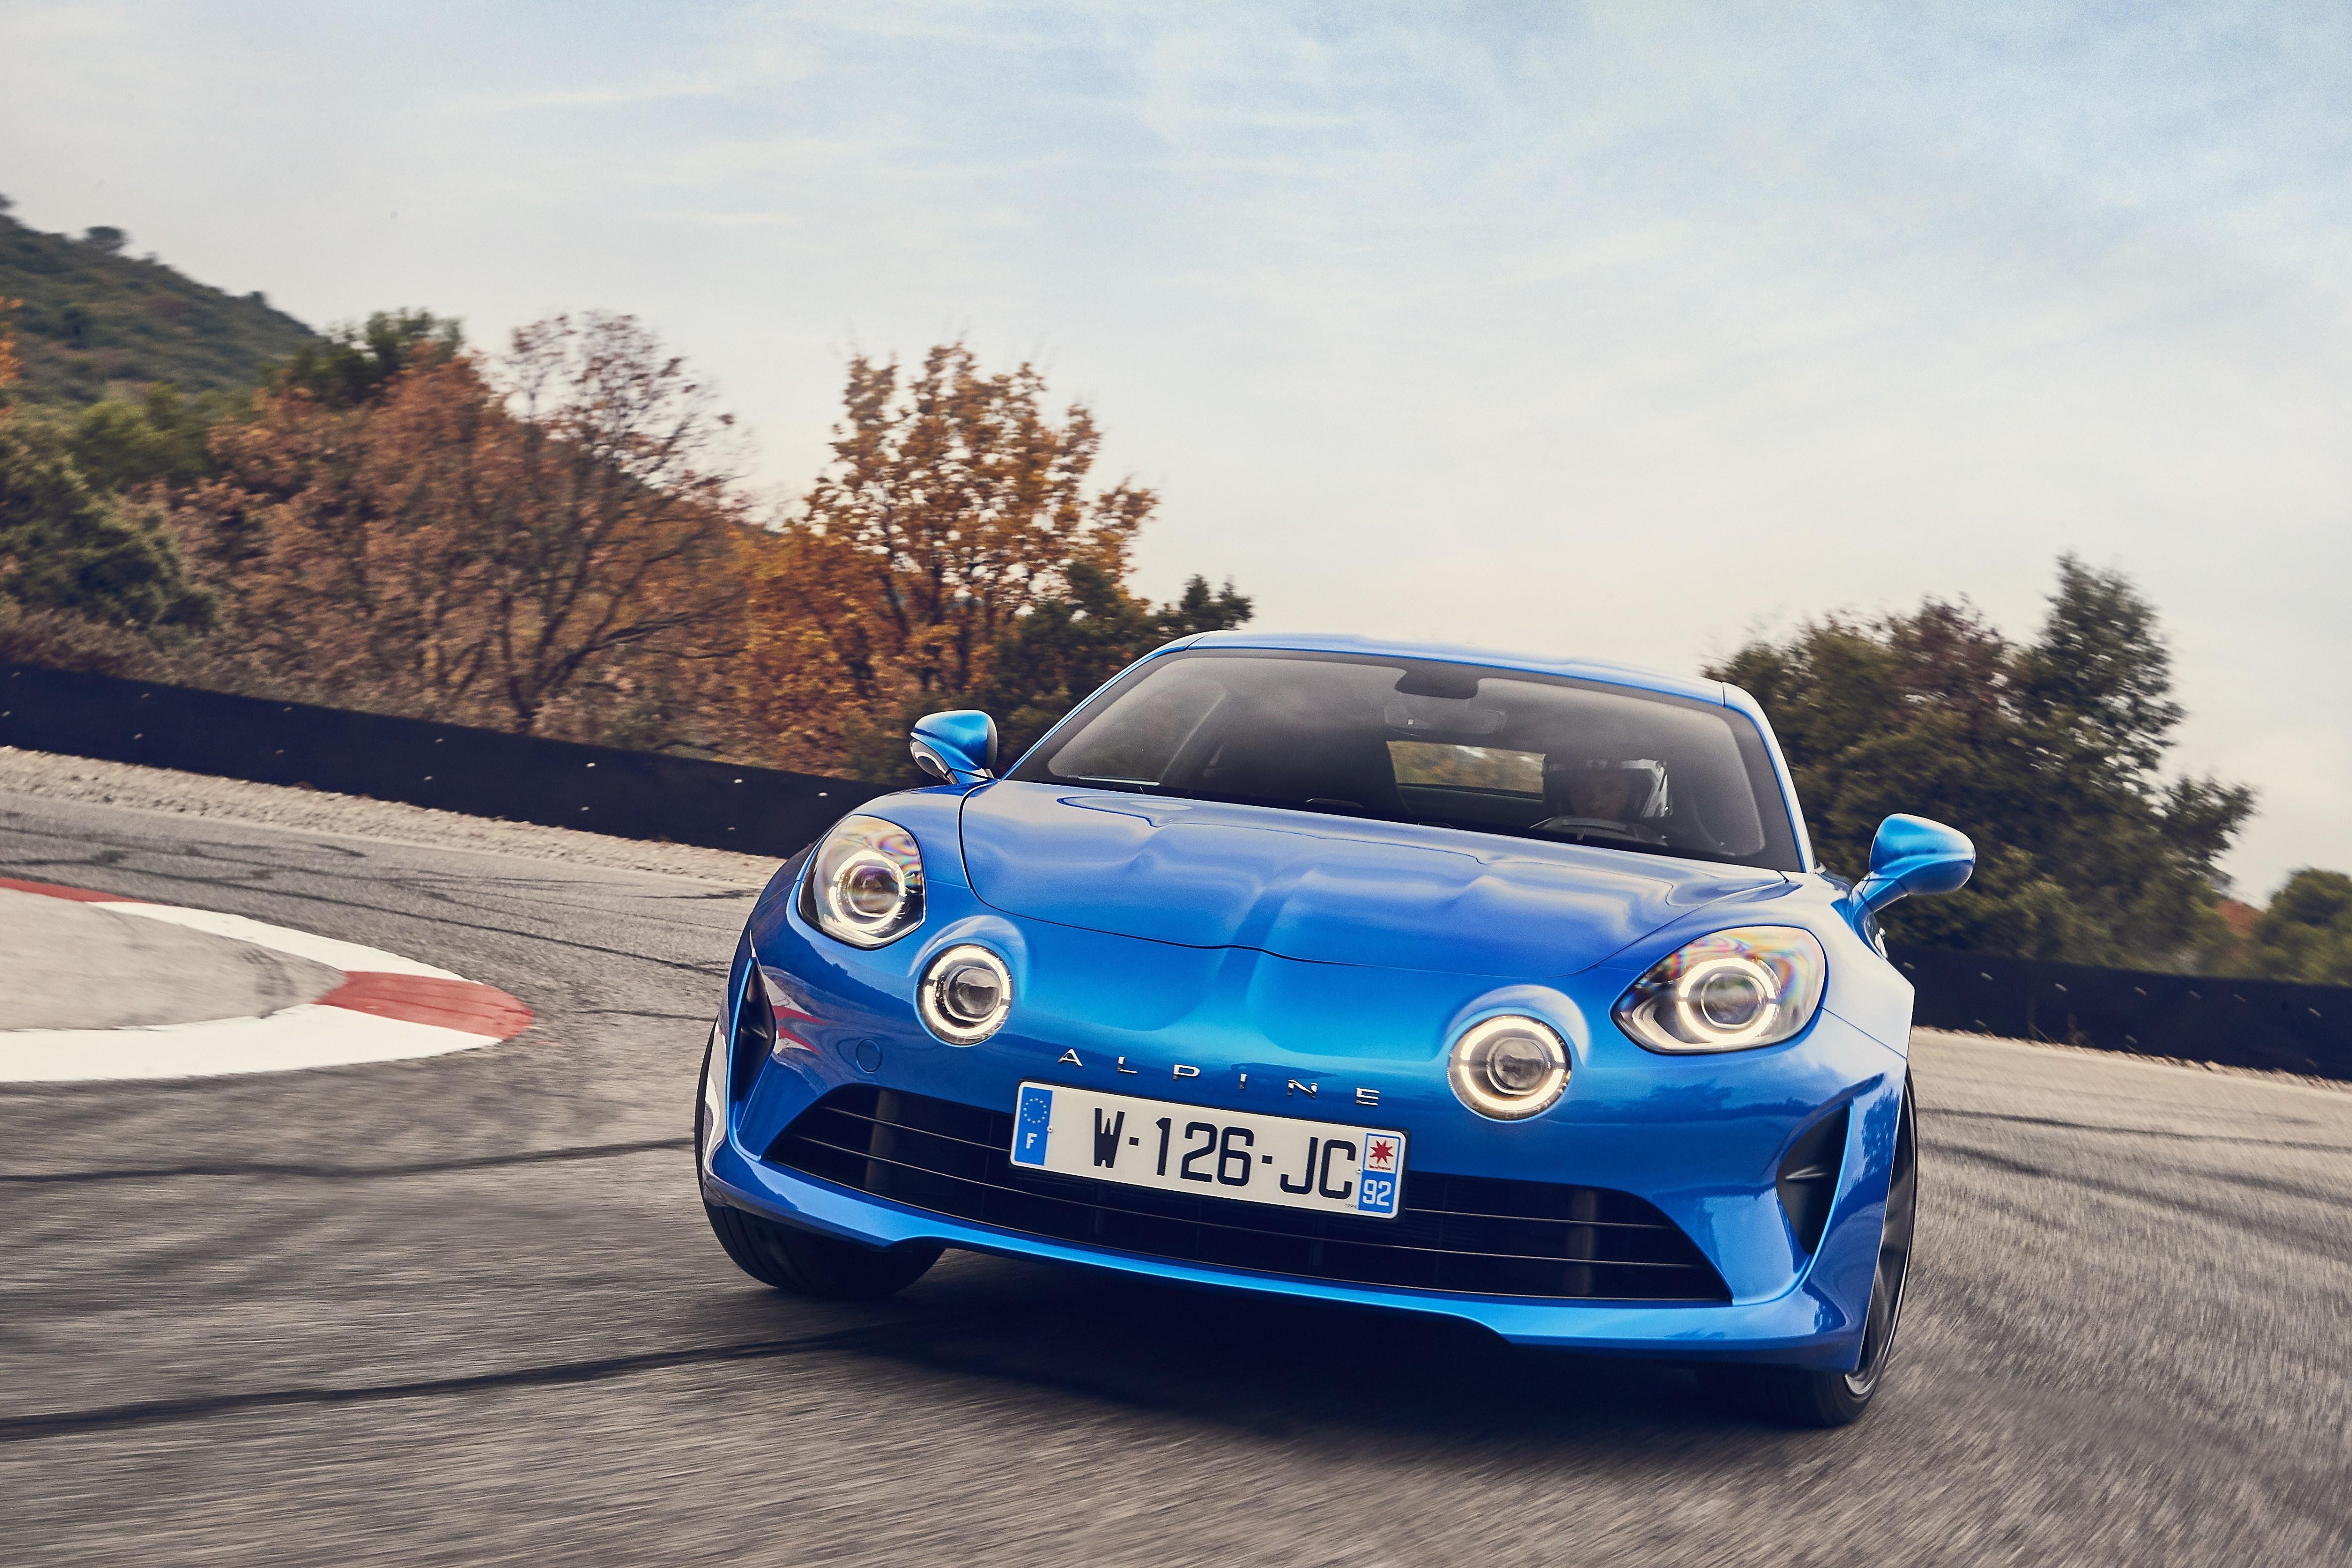 2017 - ALPINE A110 drive tests in Aix-en-Provence region